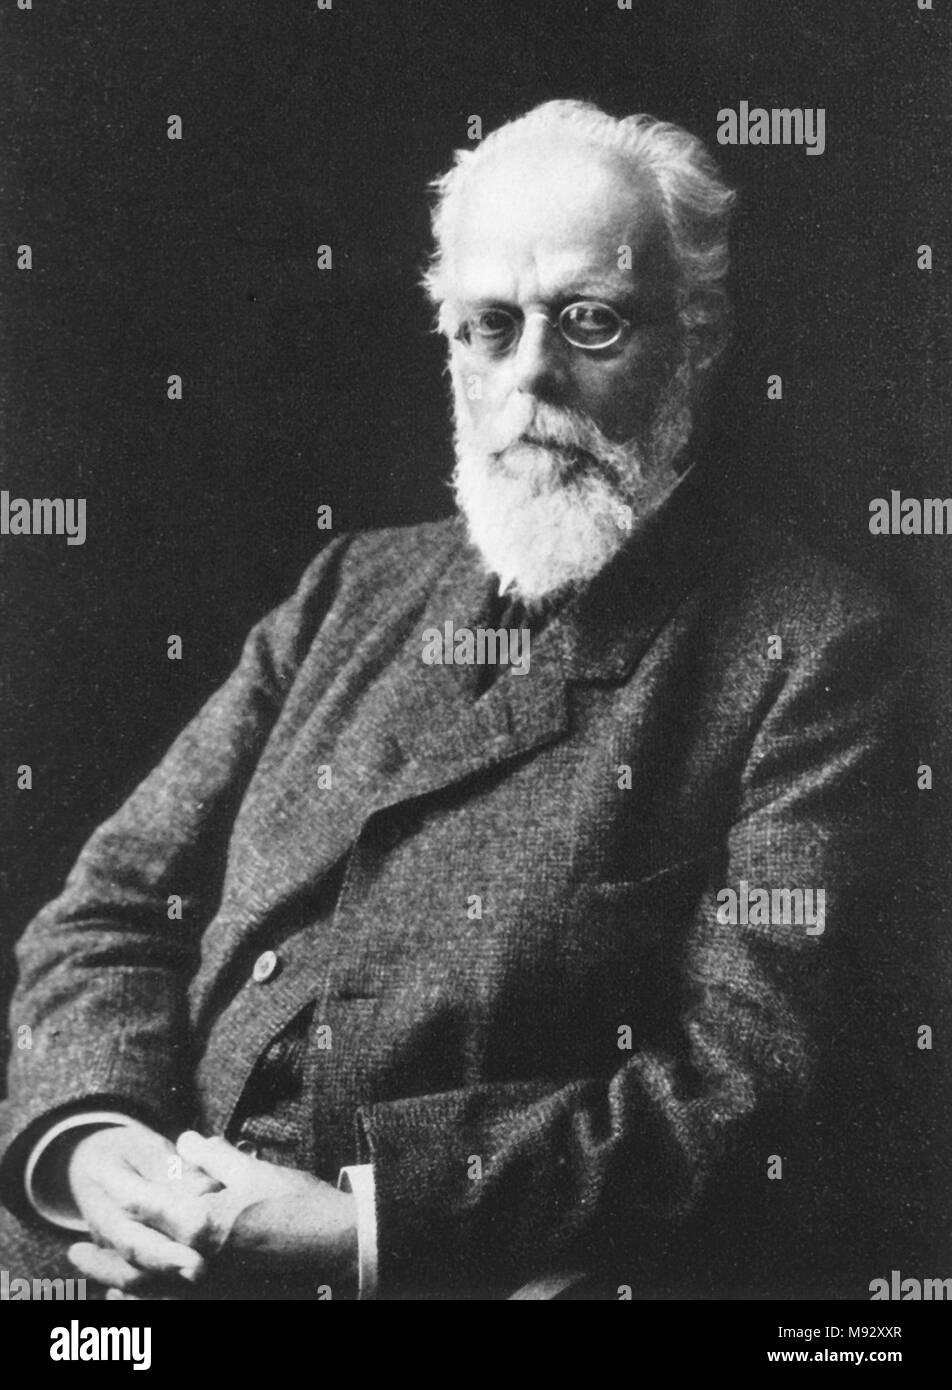 August Weismann, August Friedrich Leopold Weismann (1834 – 1914) German evolutionary biologist. - Stock Image